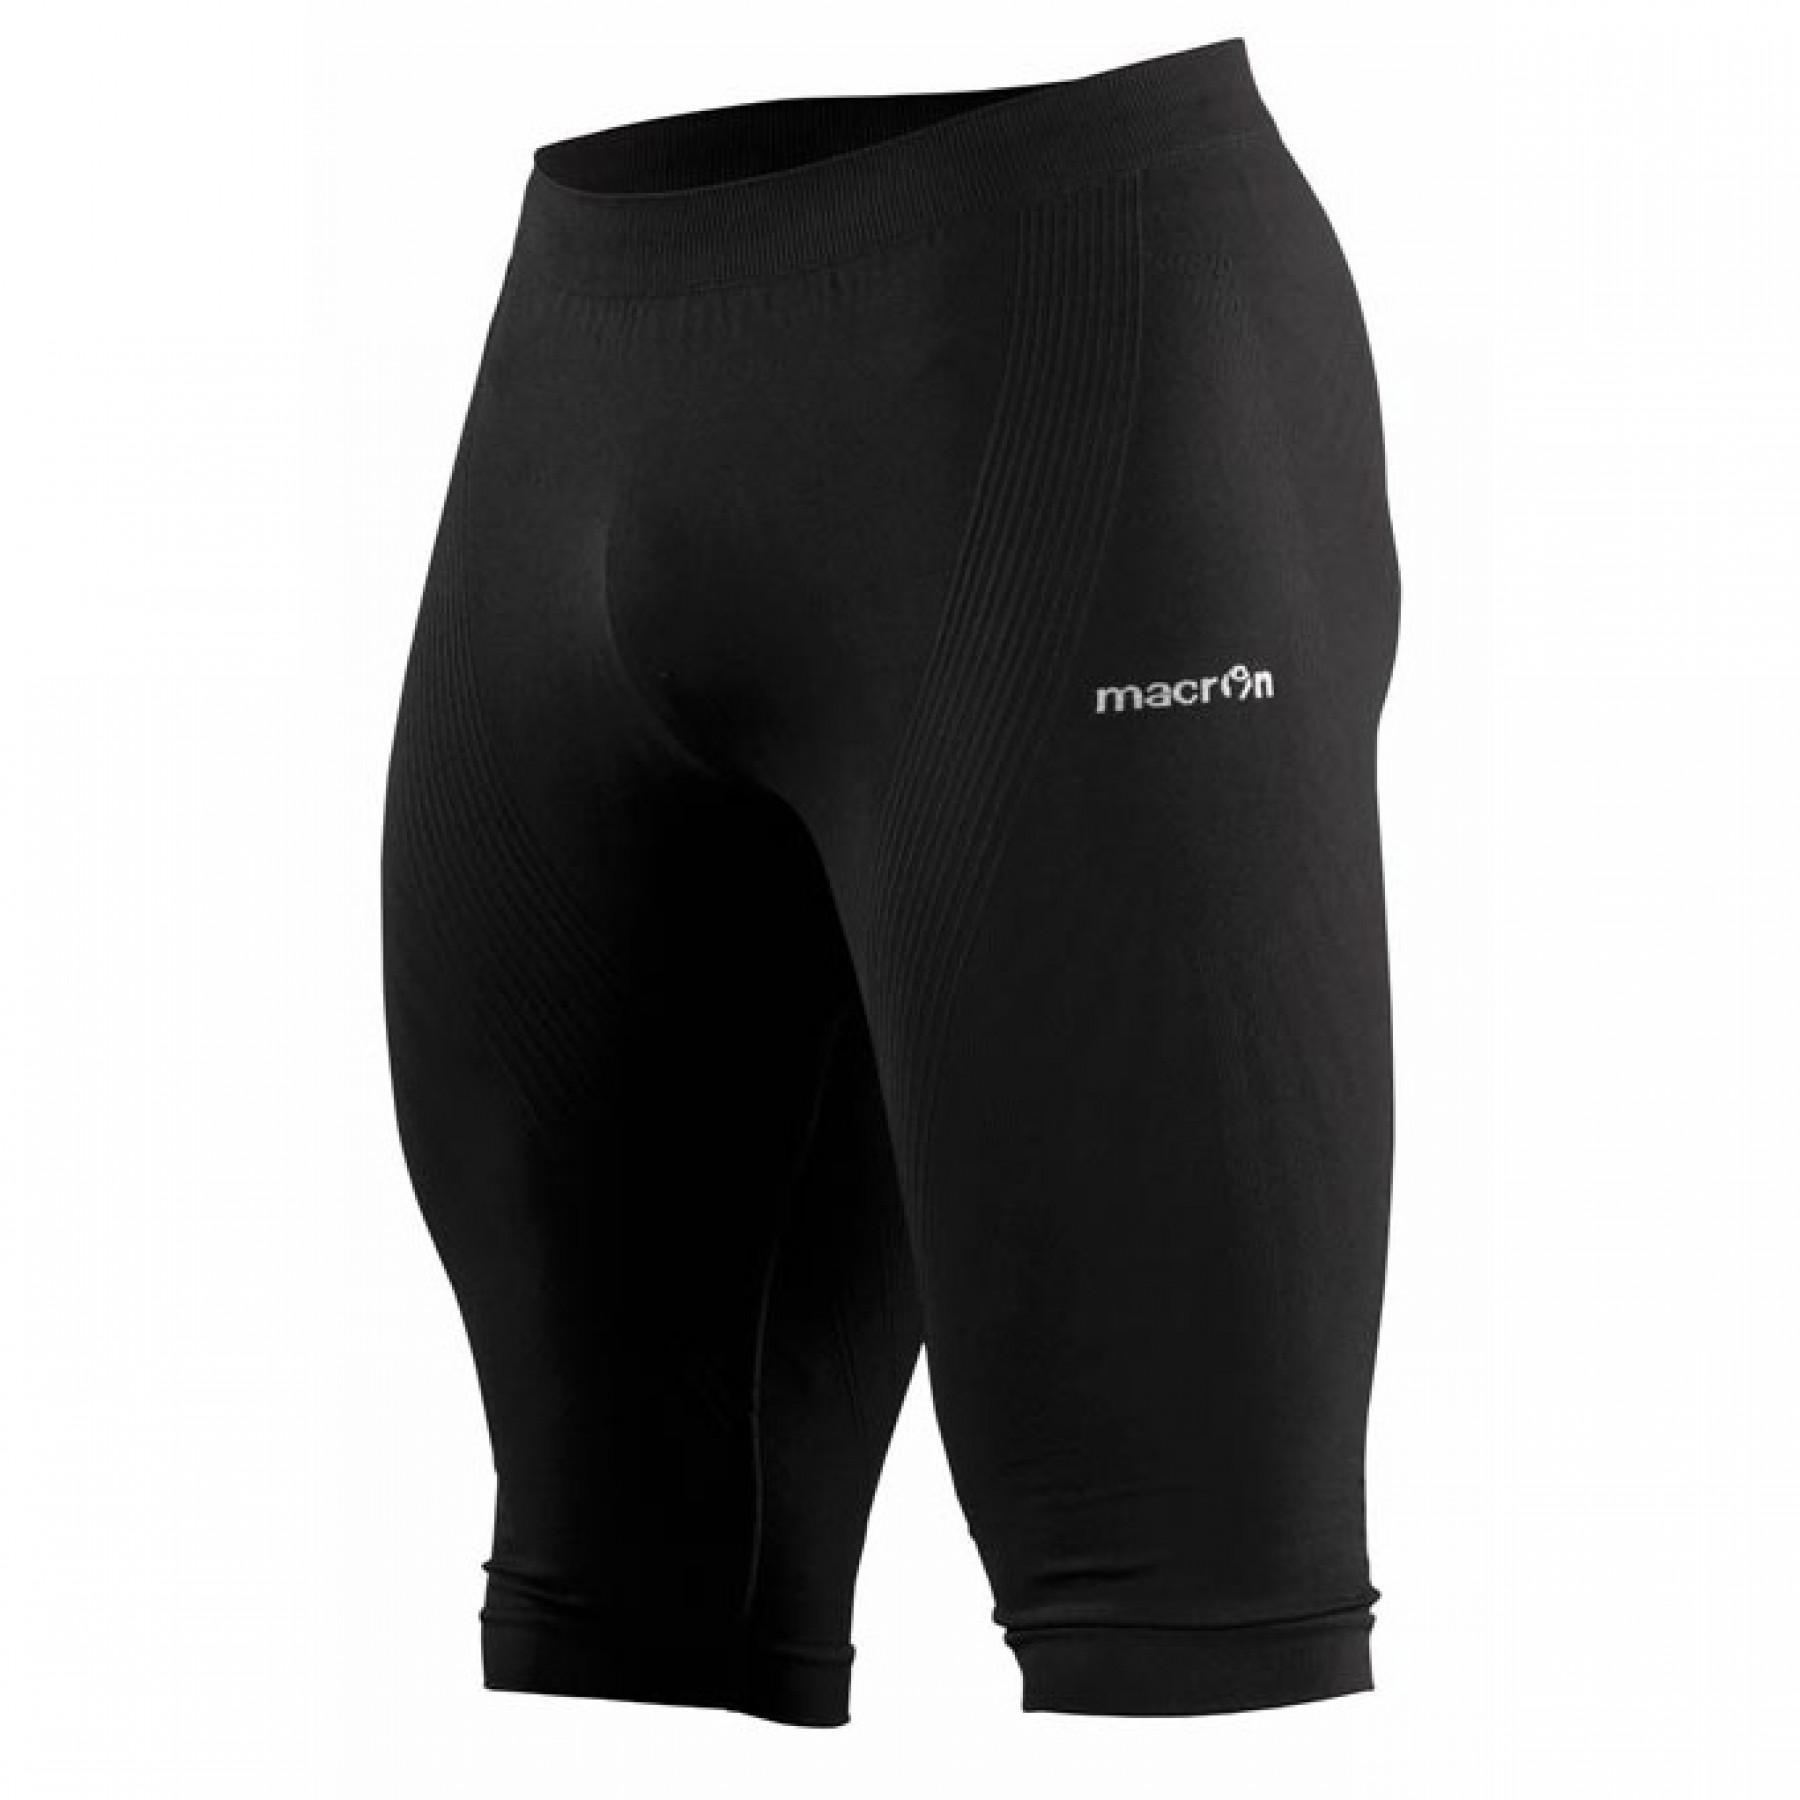 compression shorts Macron gamma